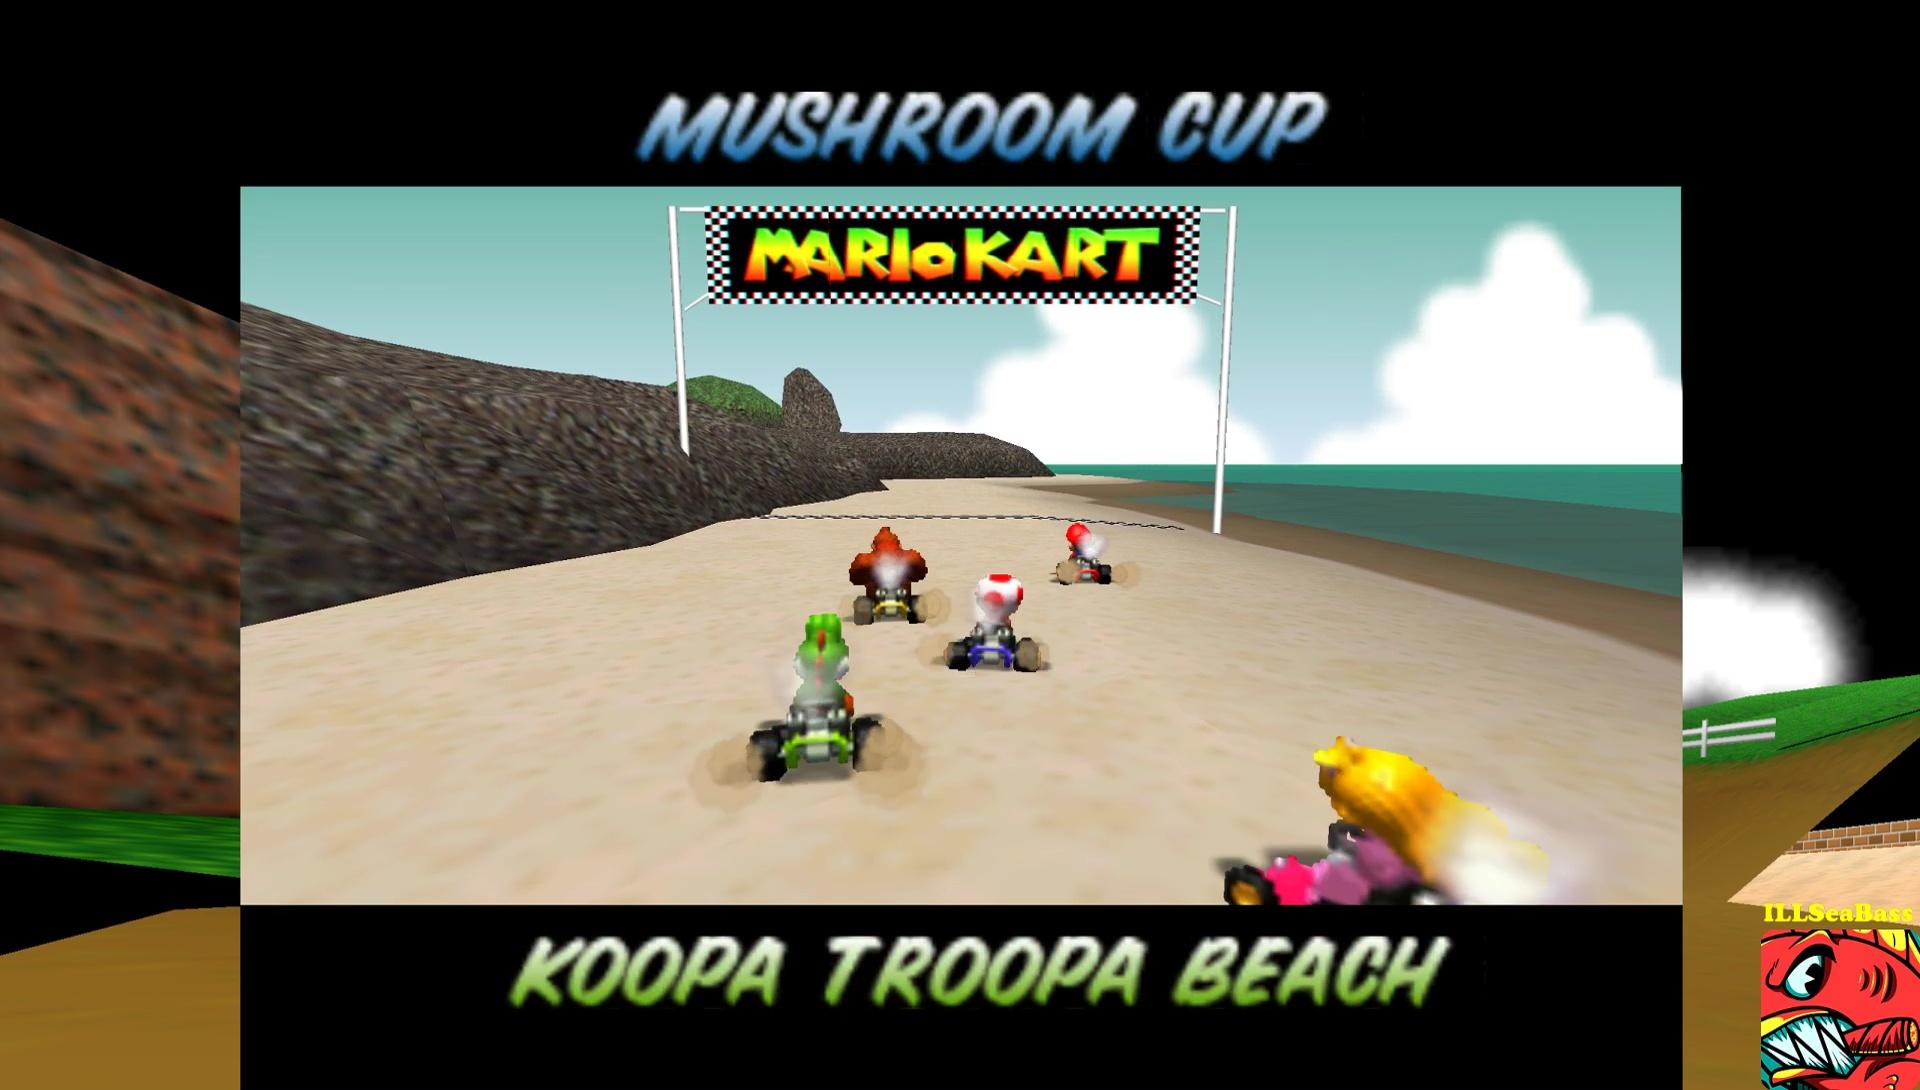 ILLSeaBass: Mario Kart 64: Koopa Troopa Beach [50cc] (N64 Emulated) 0:02:26.08 points on 2017-05-29 12:56:27